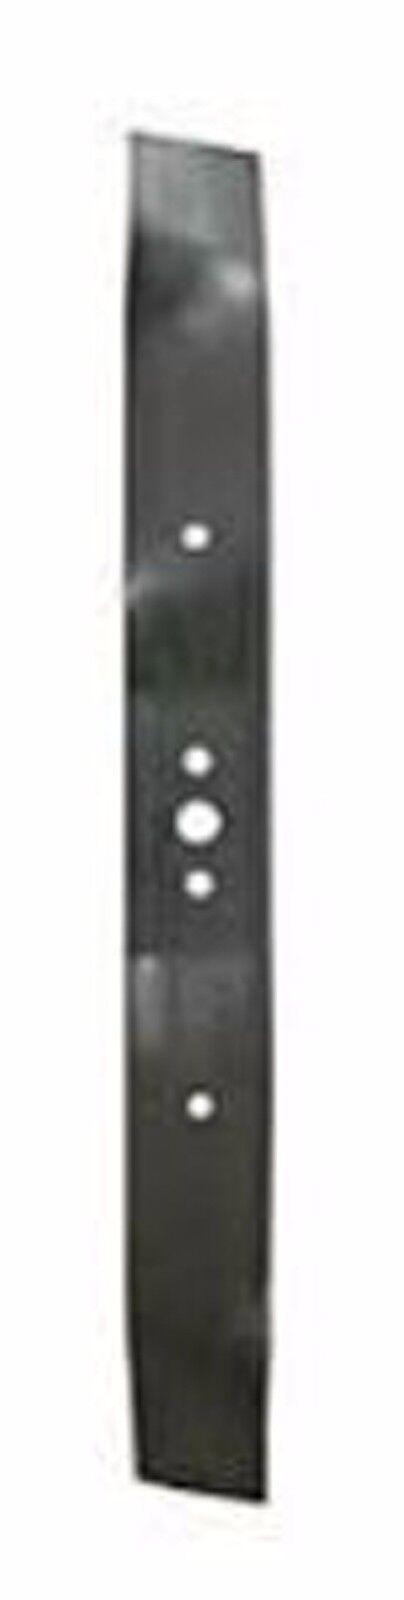 "Genuine Husqvarna 532406712 21"" Mower Deck Blade - 5521P,"